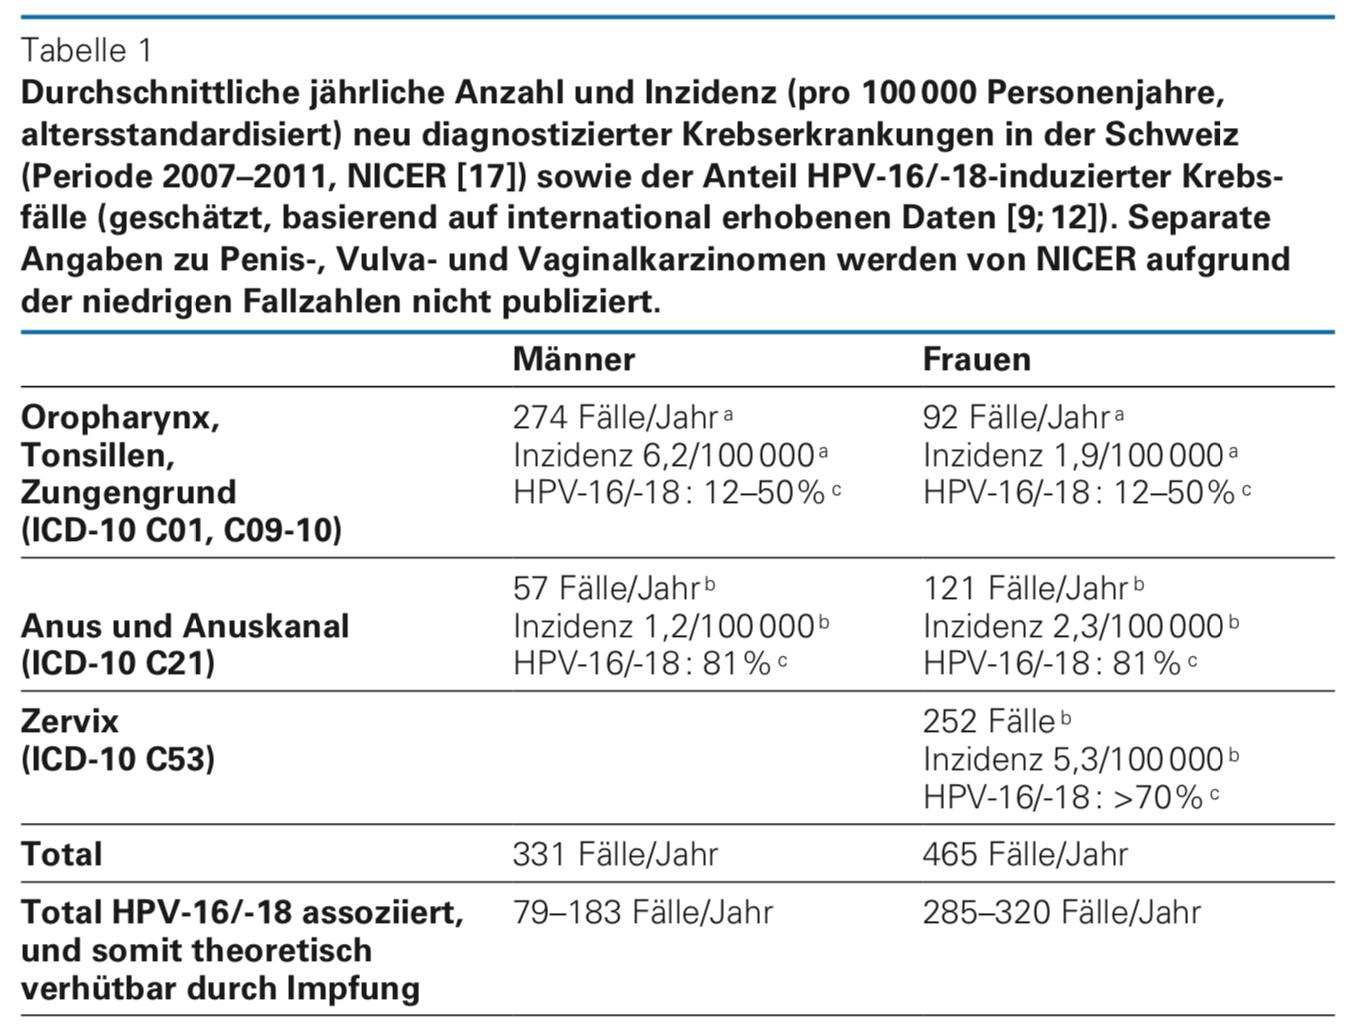 Sintomi hpv in gola. Hpv sintomi gola